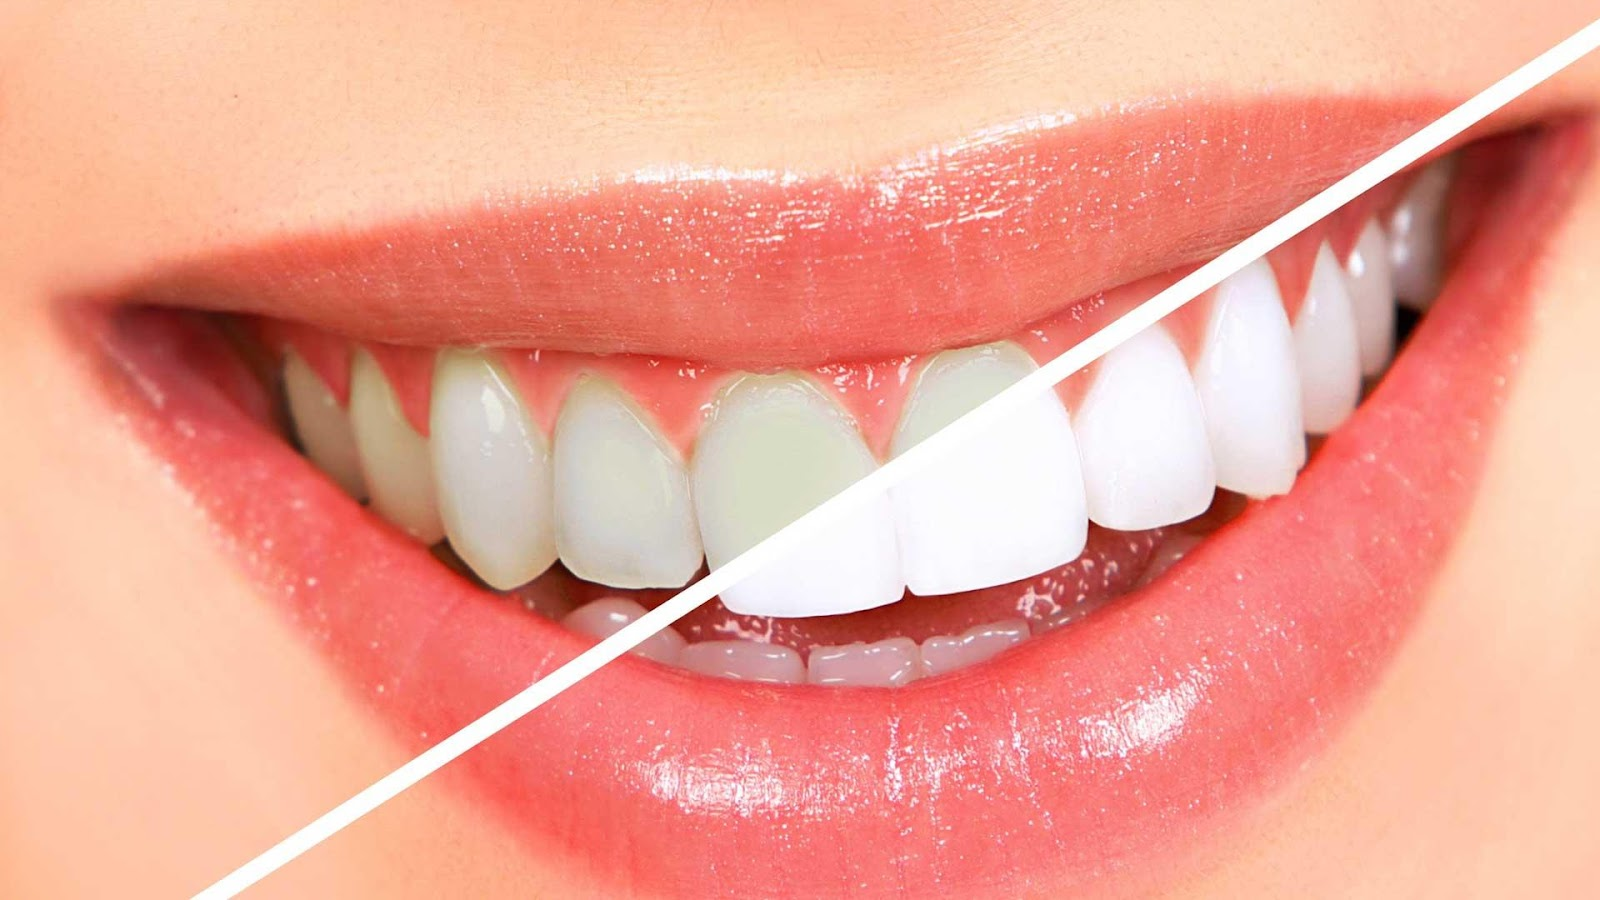 Teeth Whitening in Lahore, Pakistan - Laser Teeth Whitening